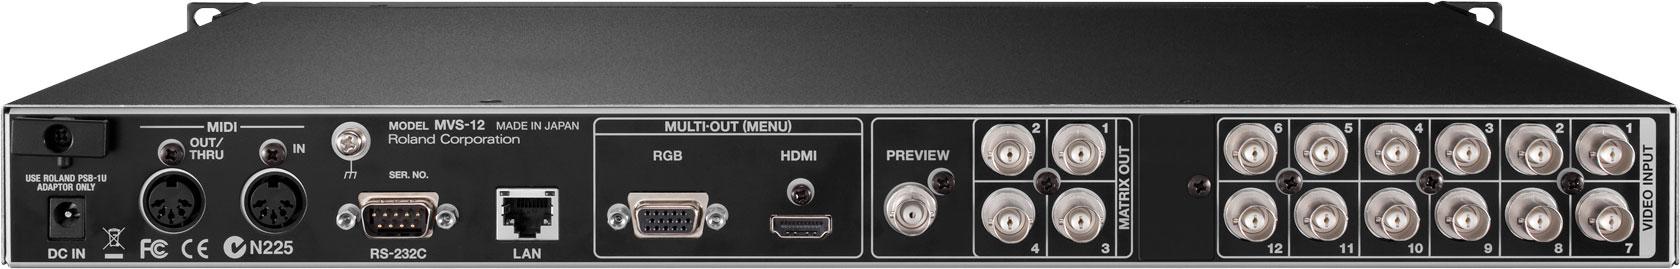 Roland Pro A/V - MVS-12 | Multi-Viewer / Switcher